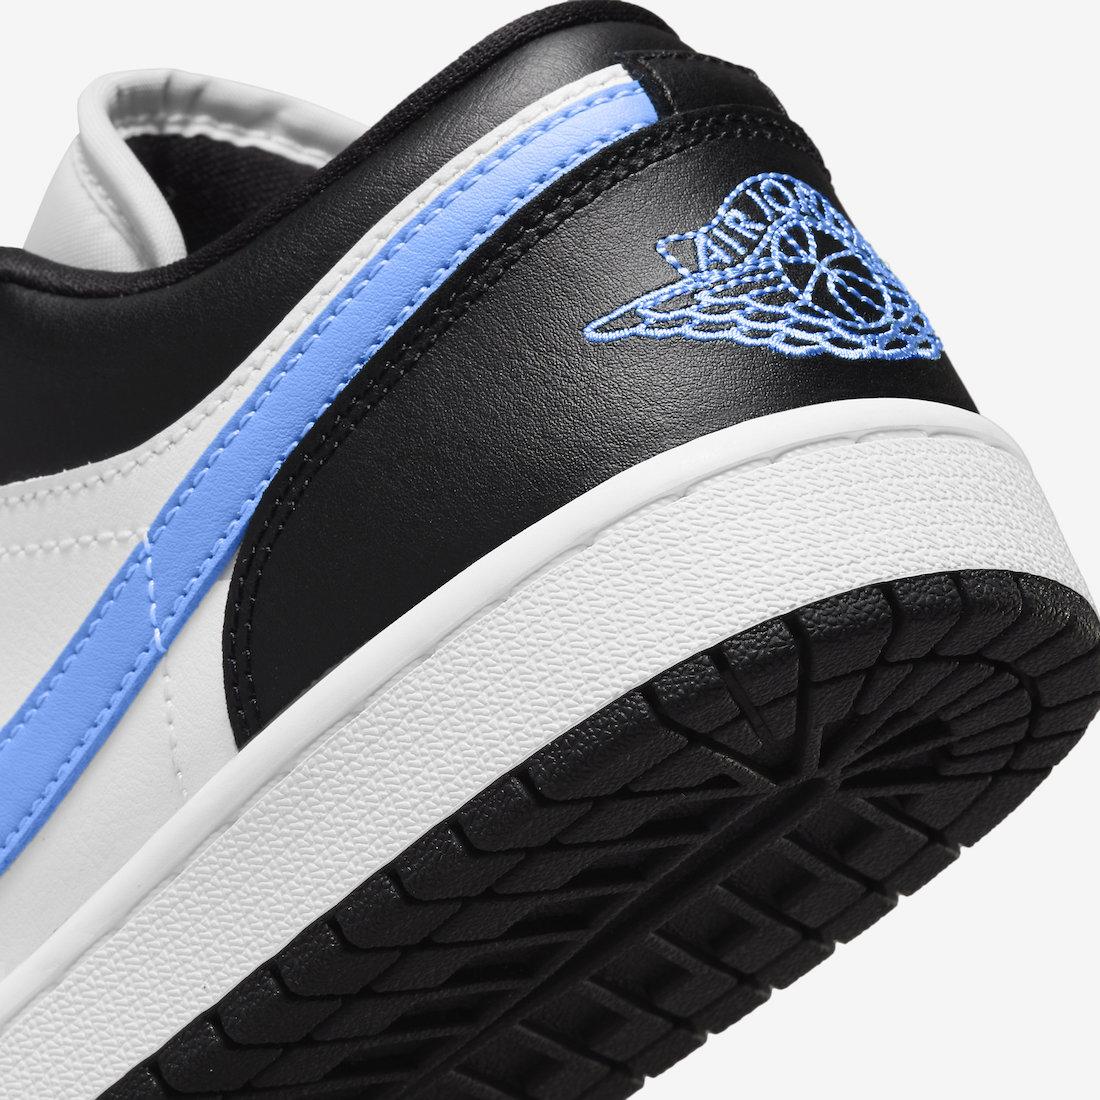 大学蓝, University Blue, Swoosh, Jumpman, Jordan, Air Jordan 1 Low, Air Jordan 1, Air Jordan